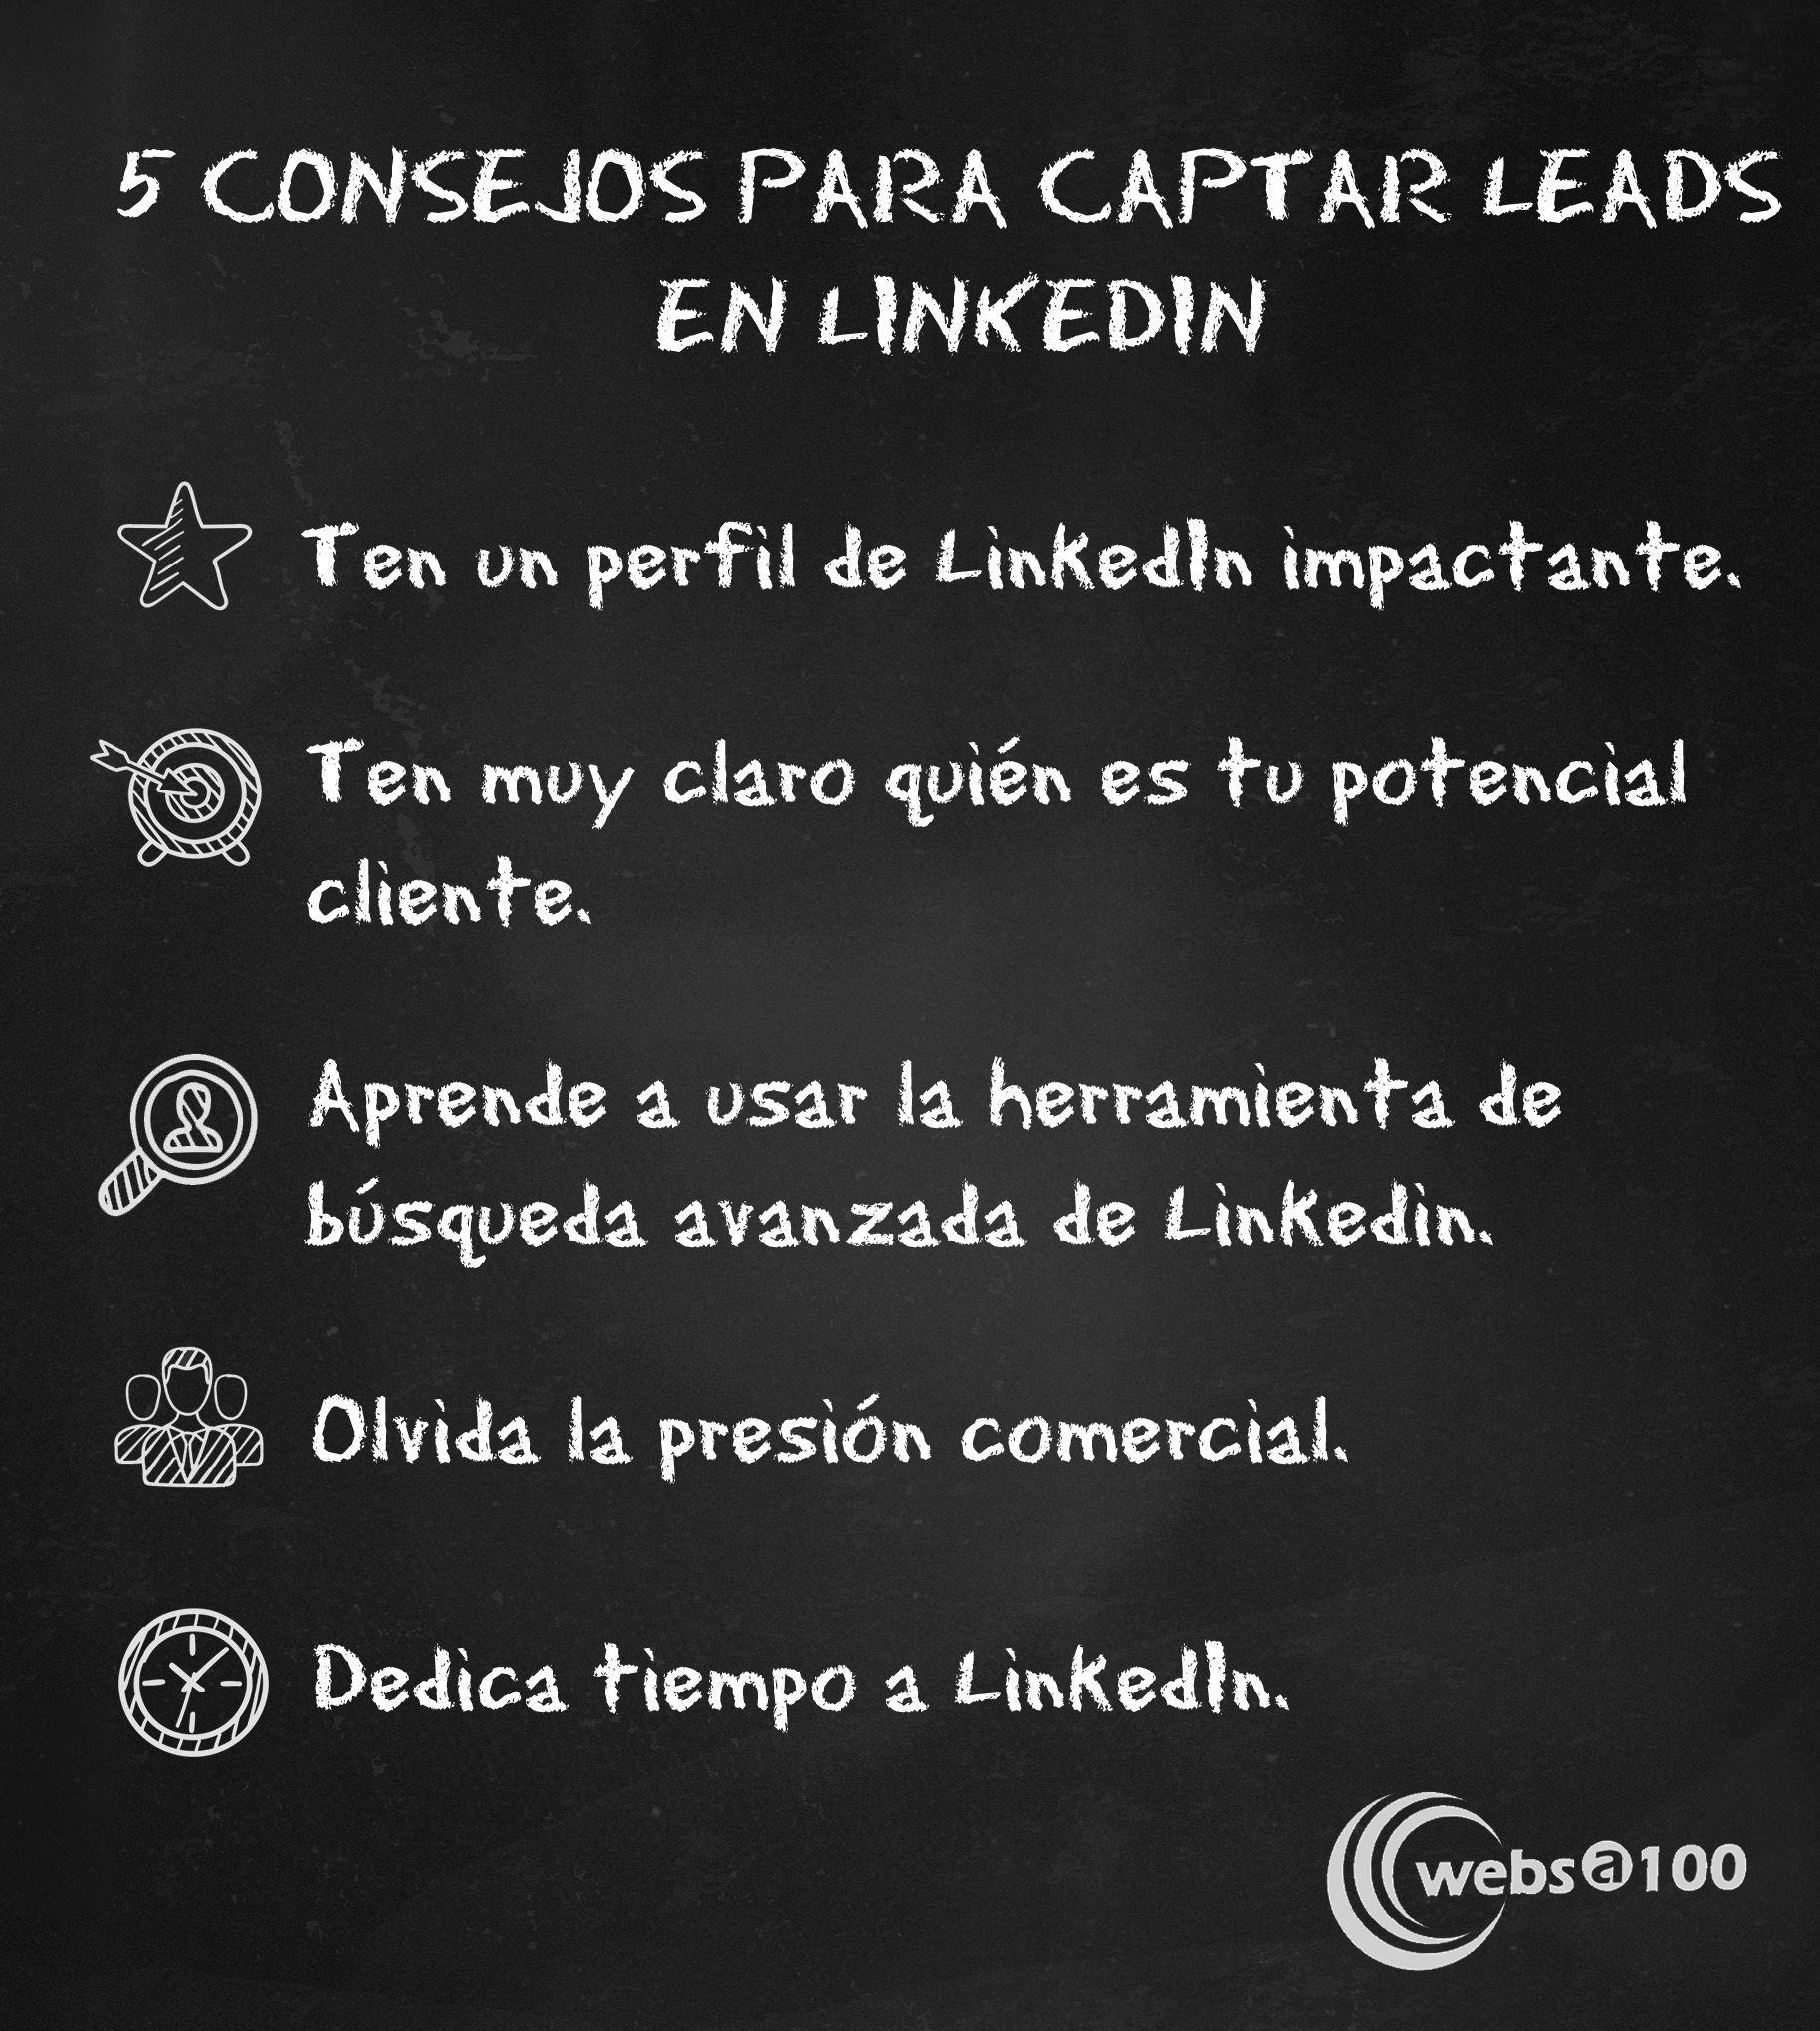 Consejos para captar leads en LinkedIn